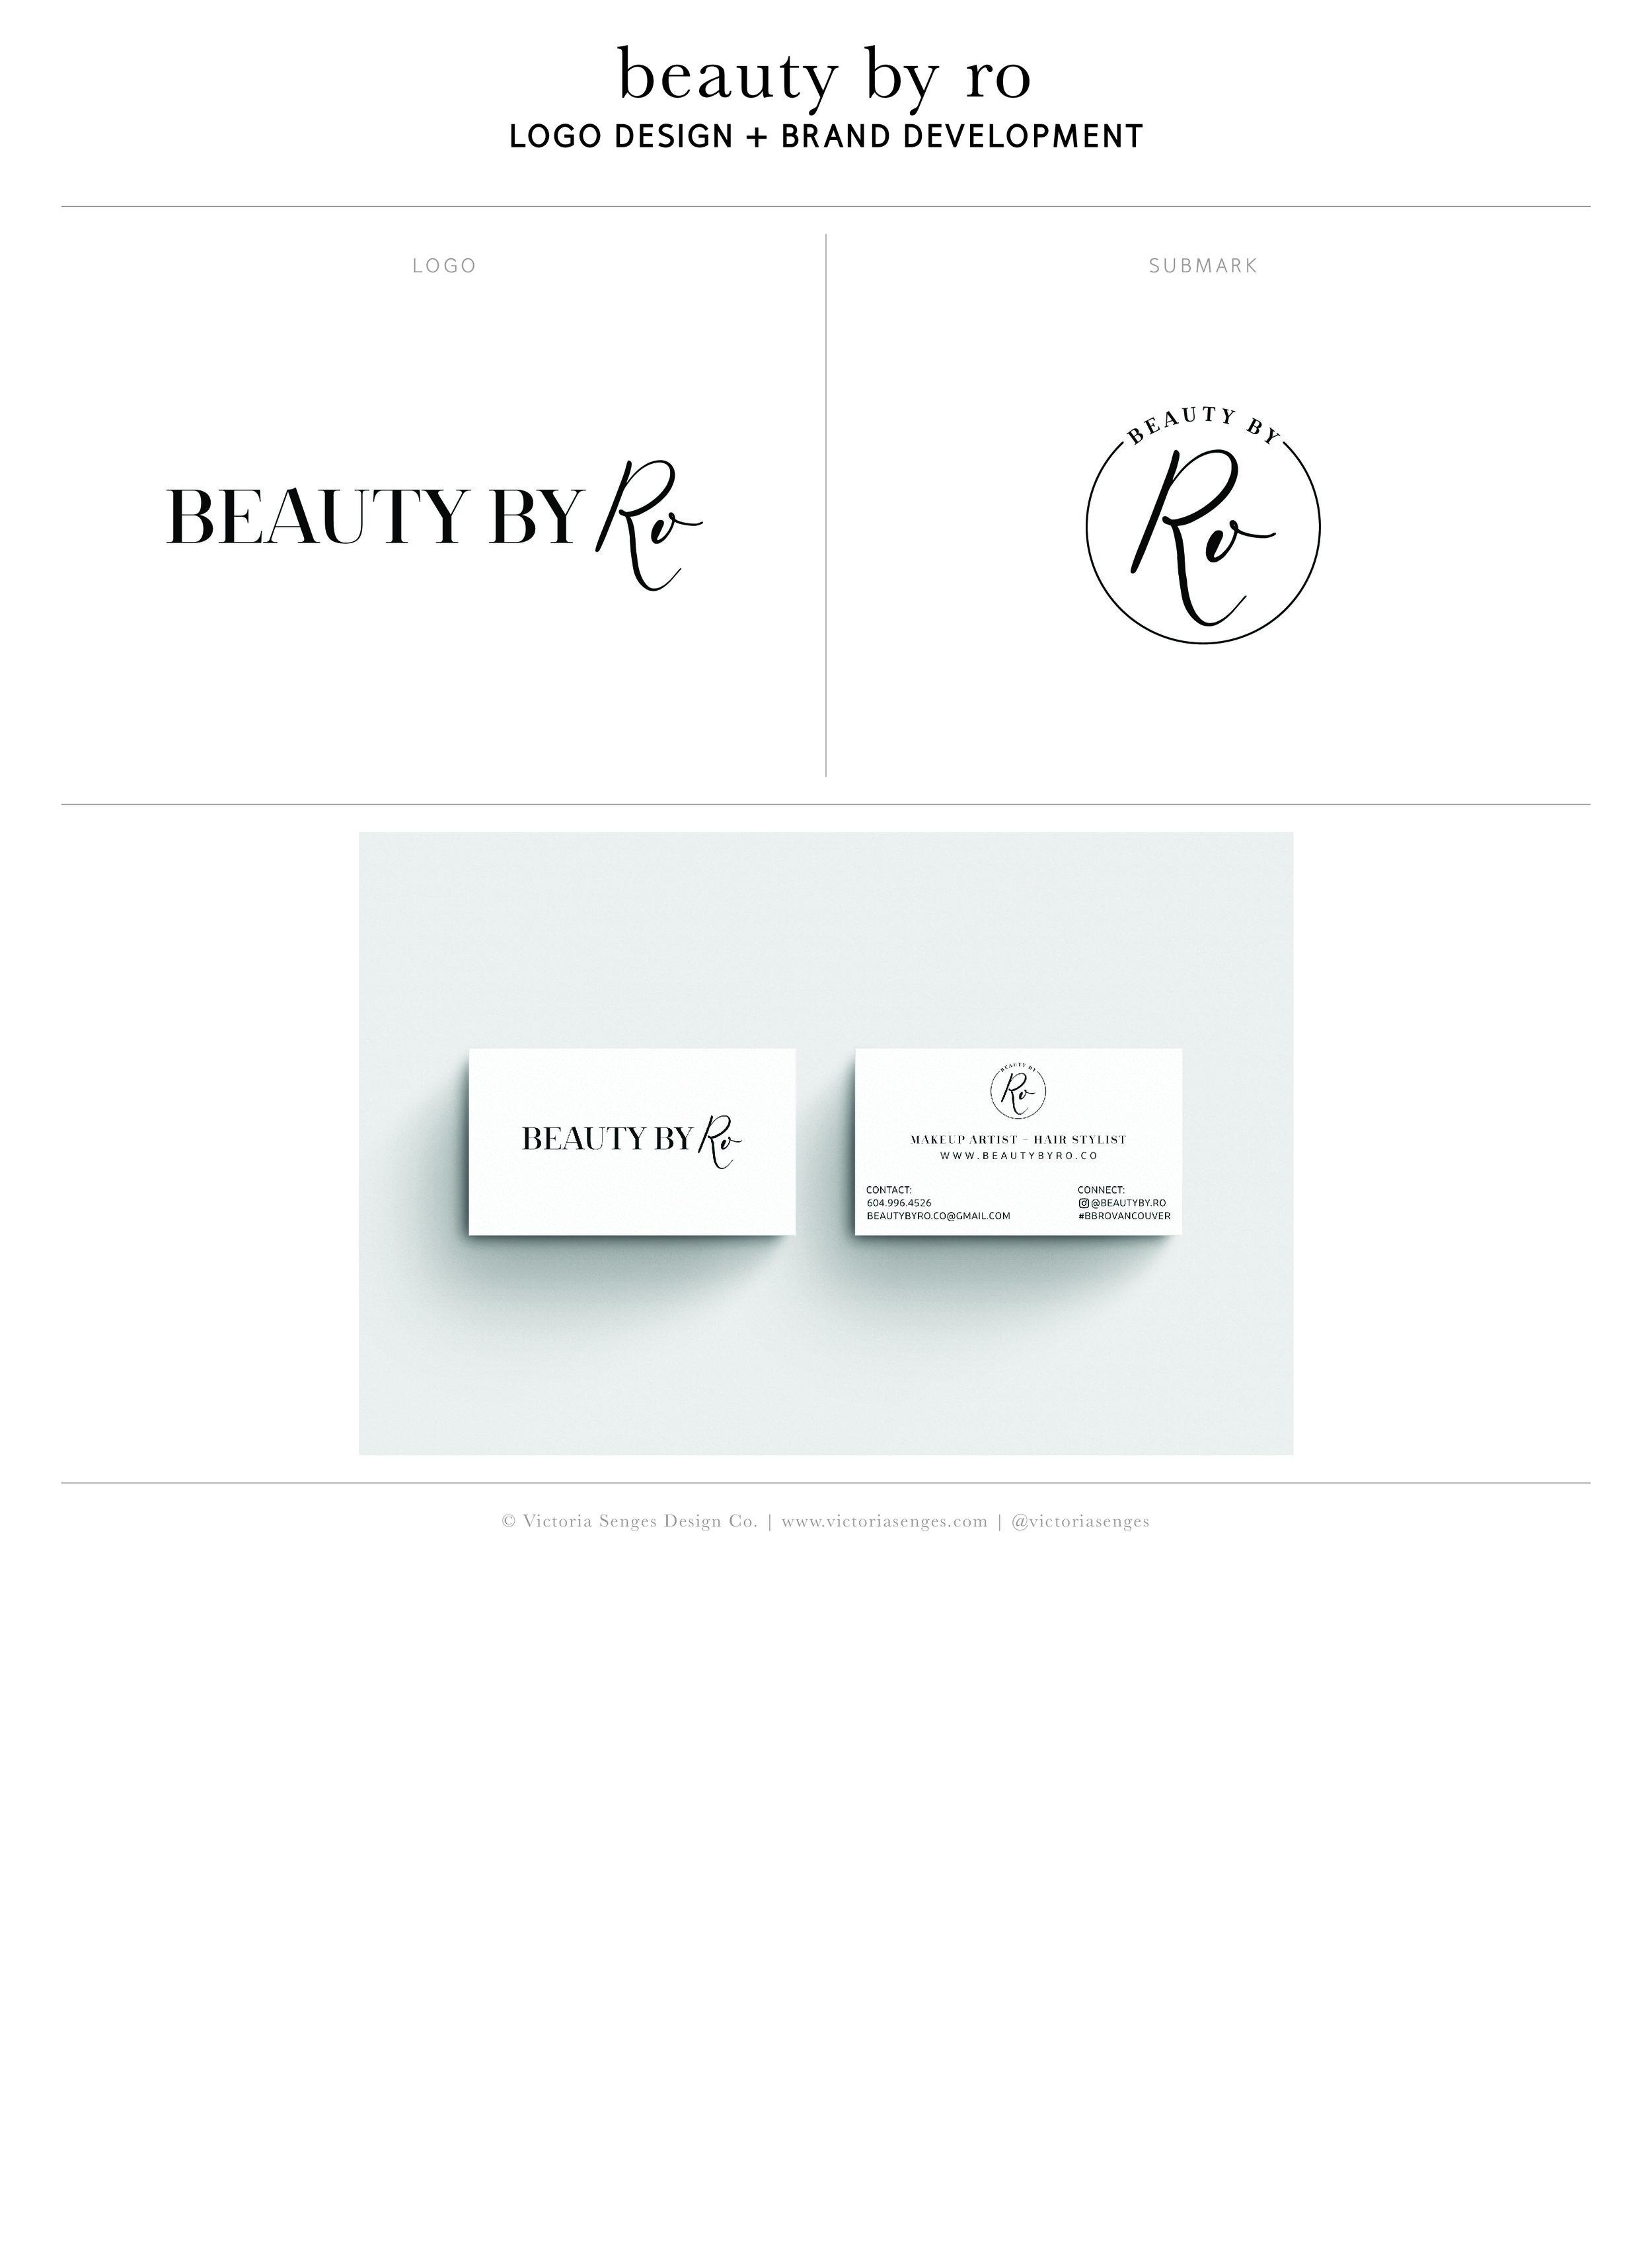 beautybyro-branding.jpg